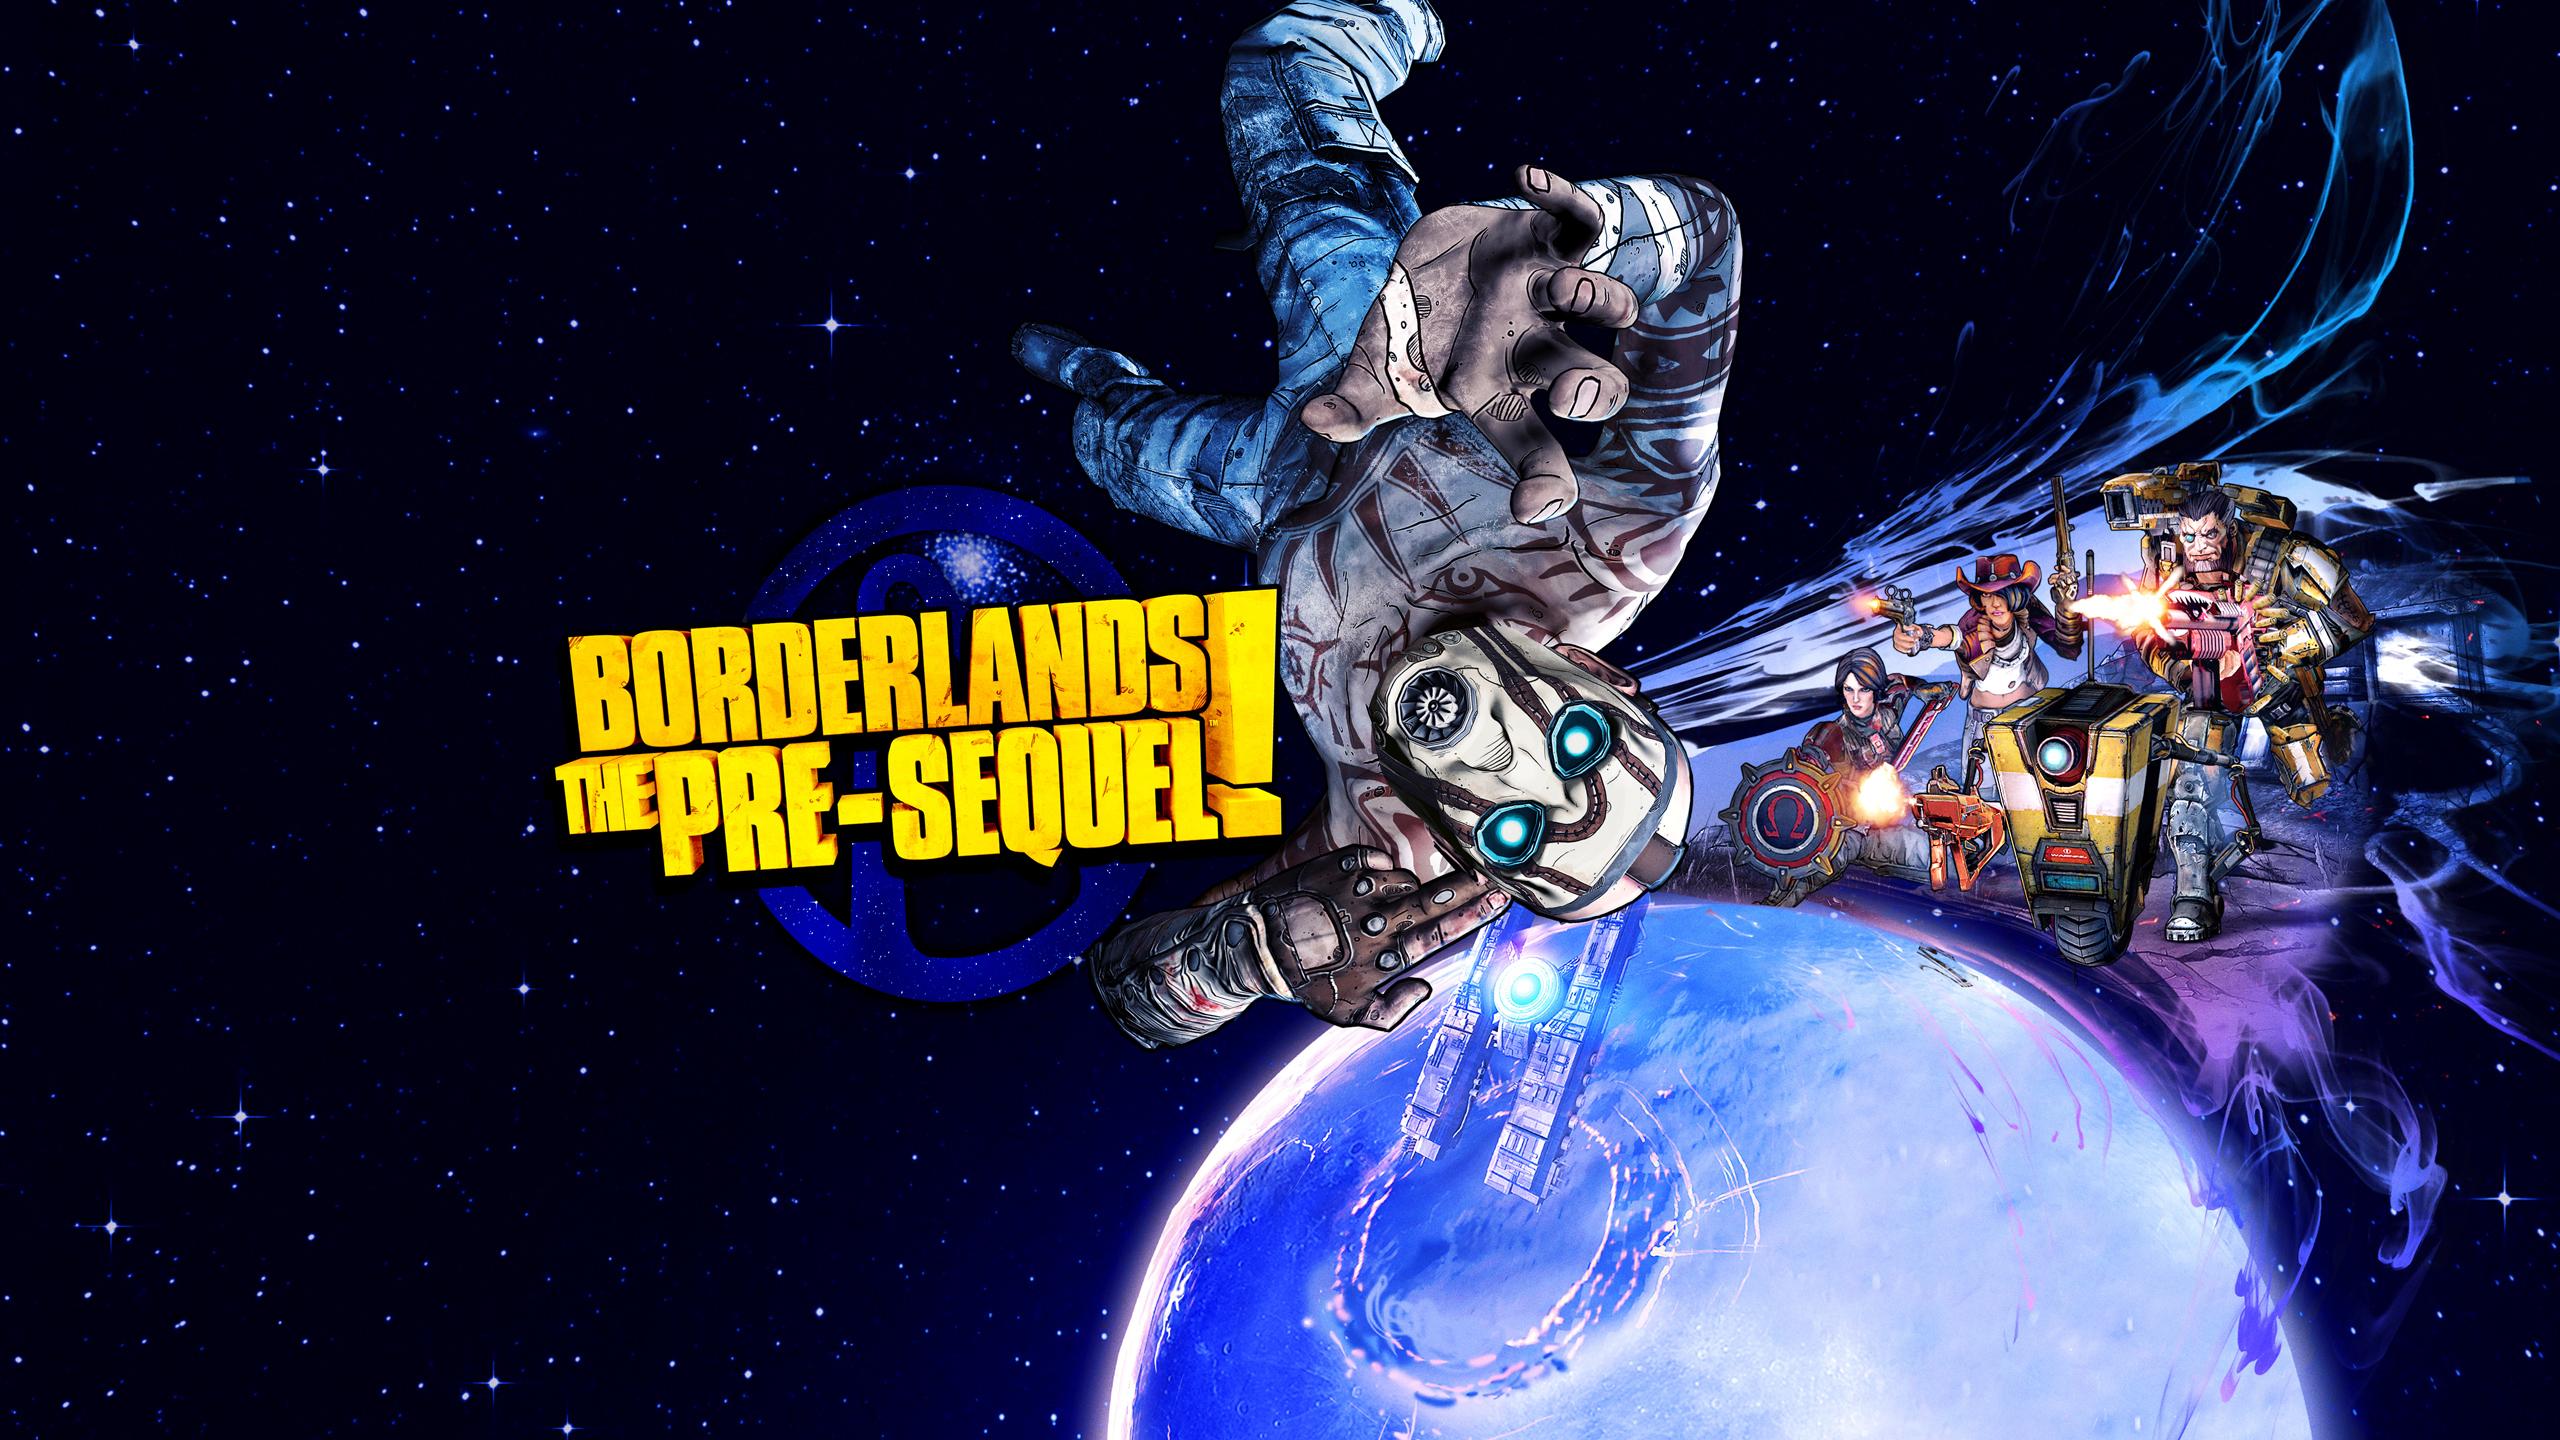 borderlandspresequel.jpg (2560×1440)